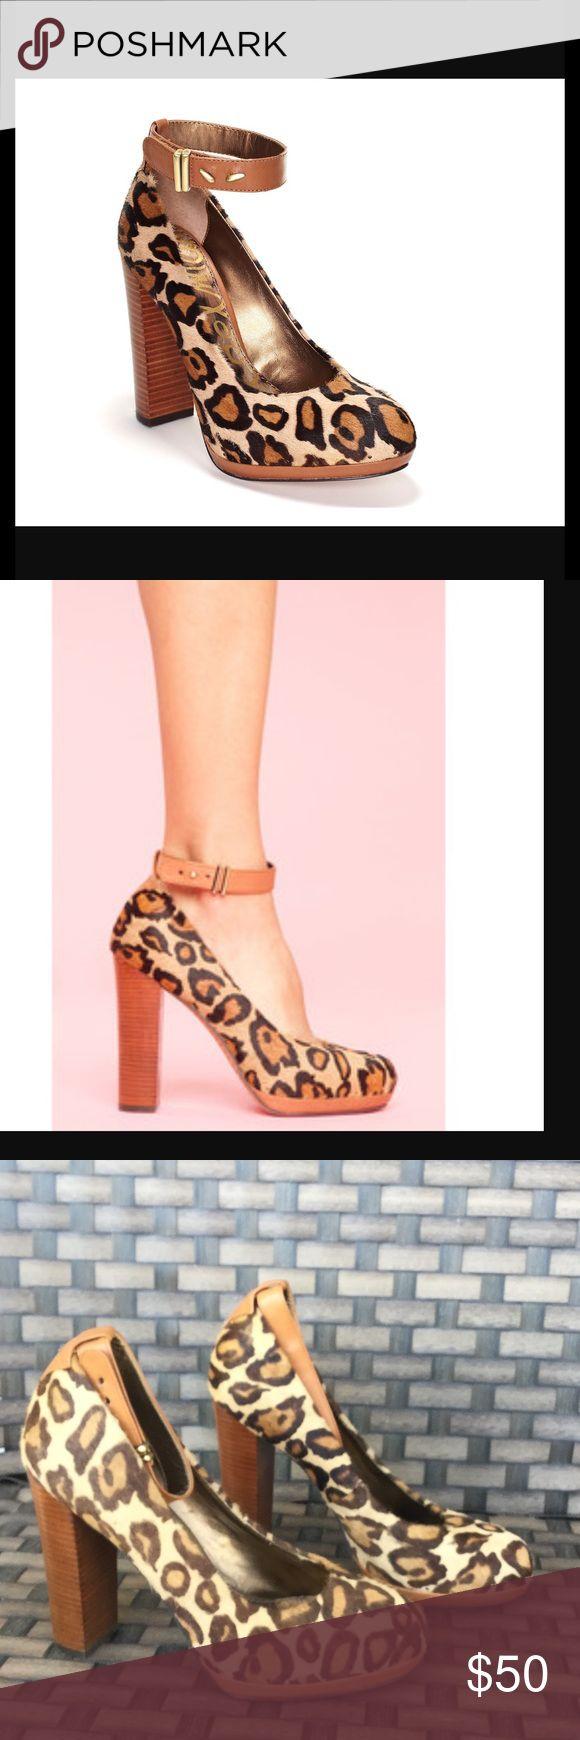 Sam Edelman Lyla cheetah heel Like new Sam Edelman Shoes Heels